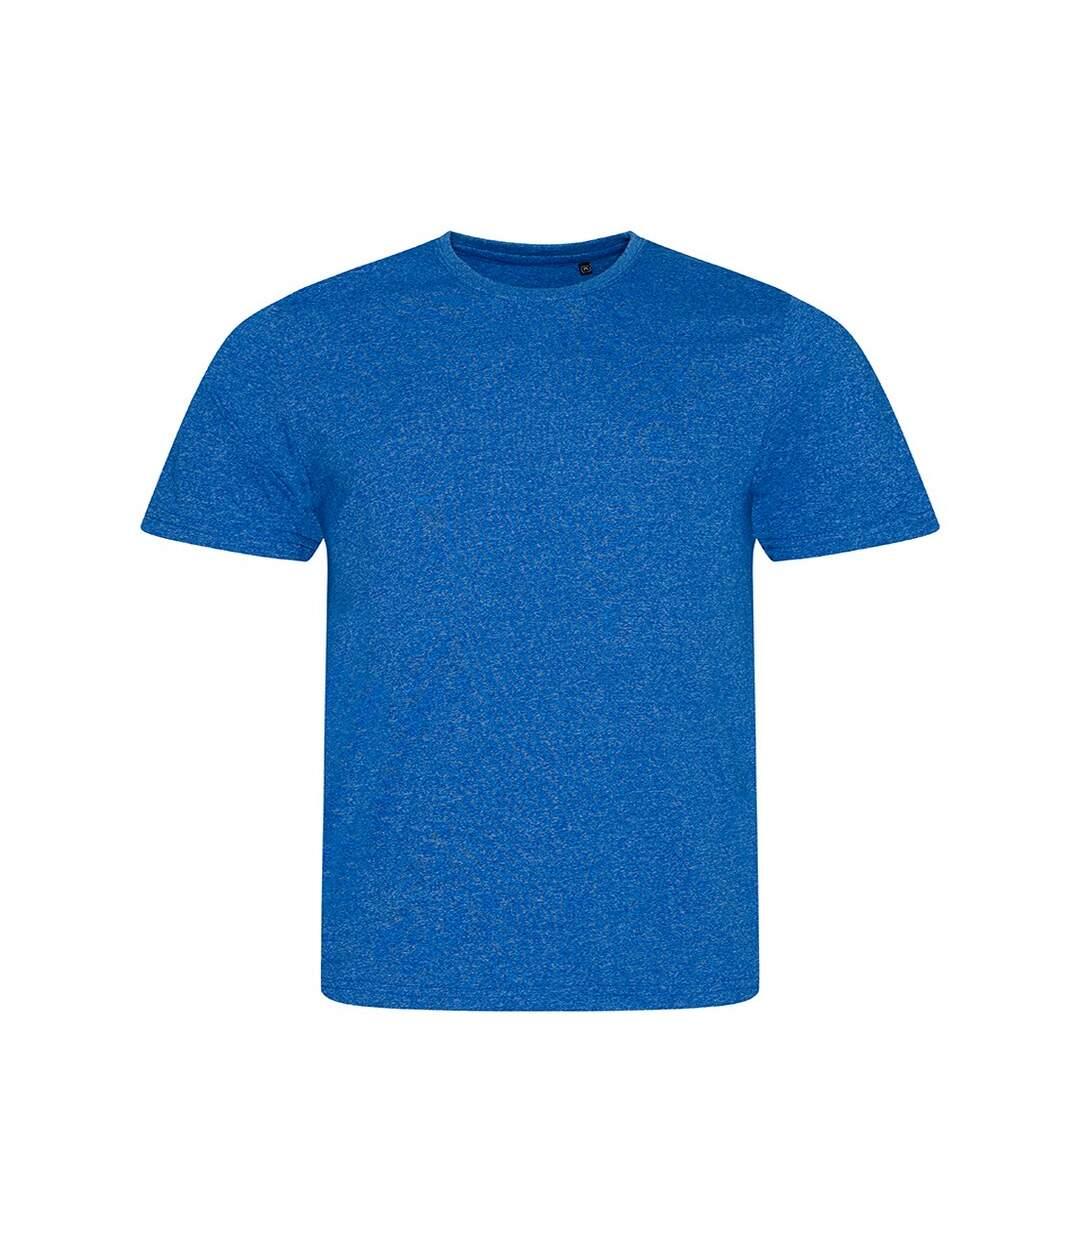 AWDis Mens Space Blend T Shirt (Space Royal Blue/White) - UTPC2897